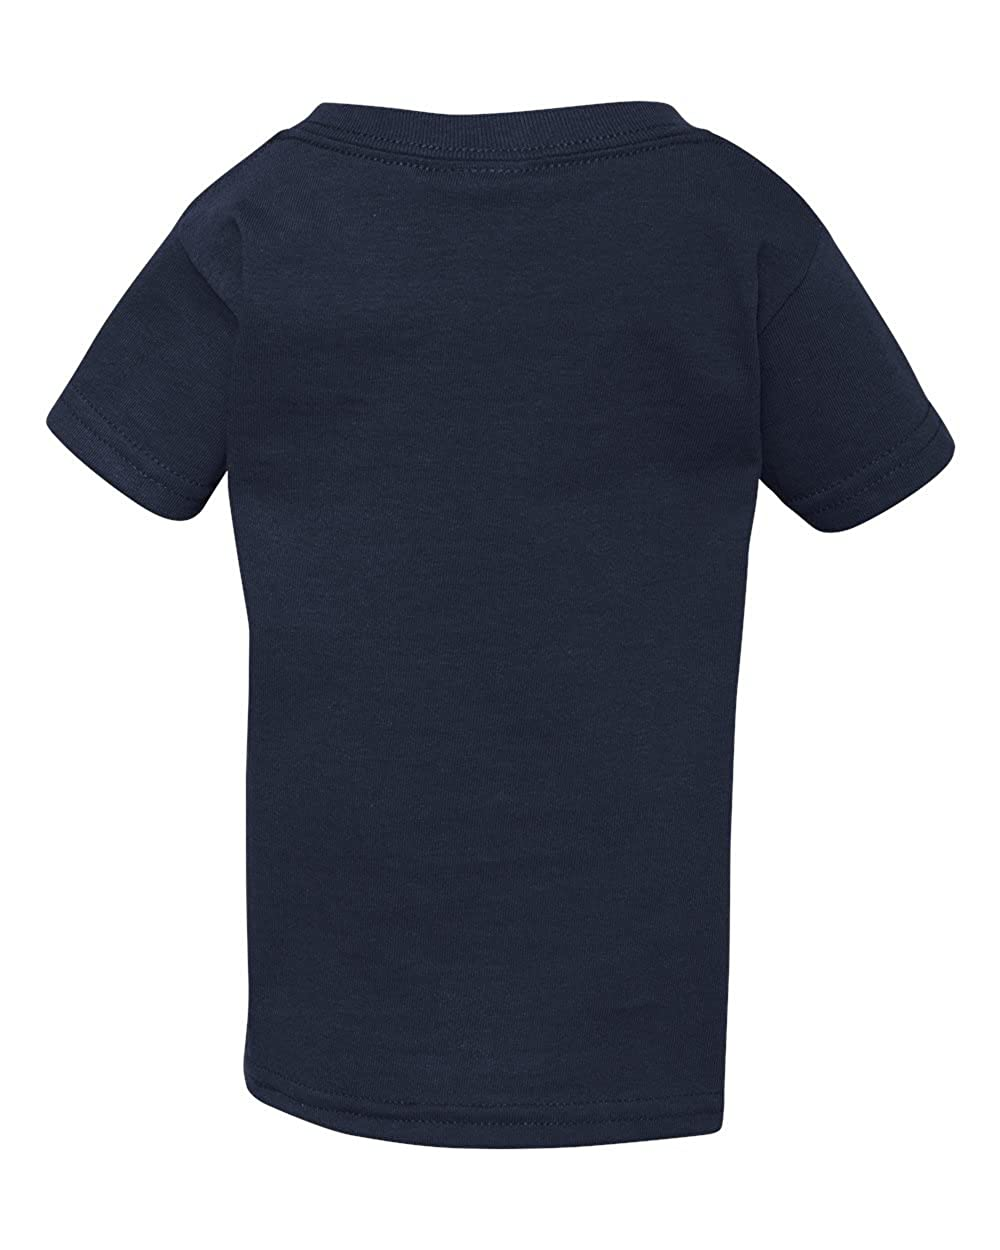 5100P Heavy Cotton Toddler T Shirt